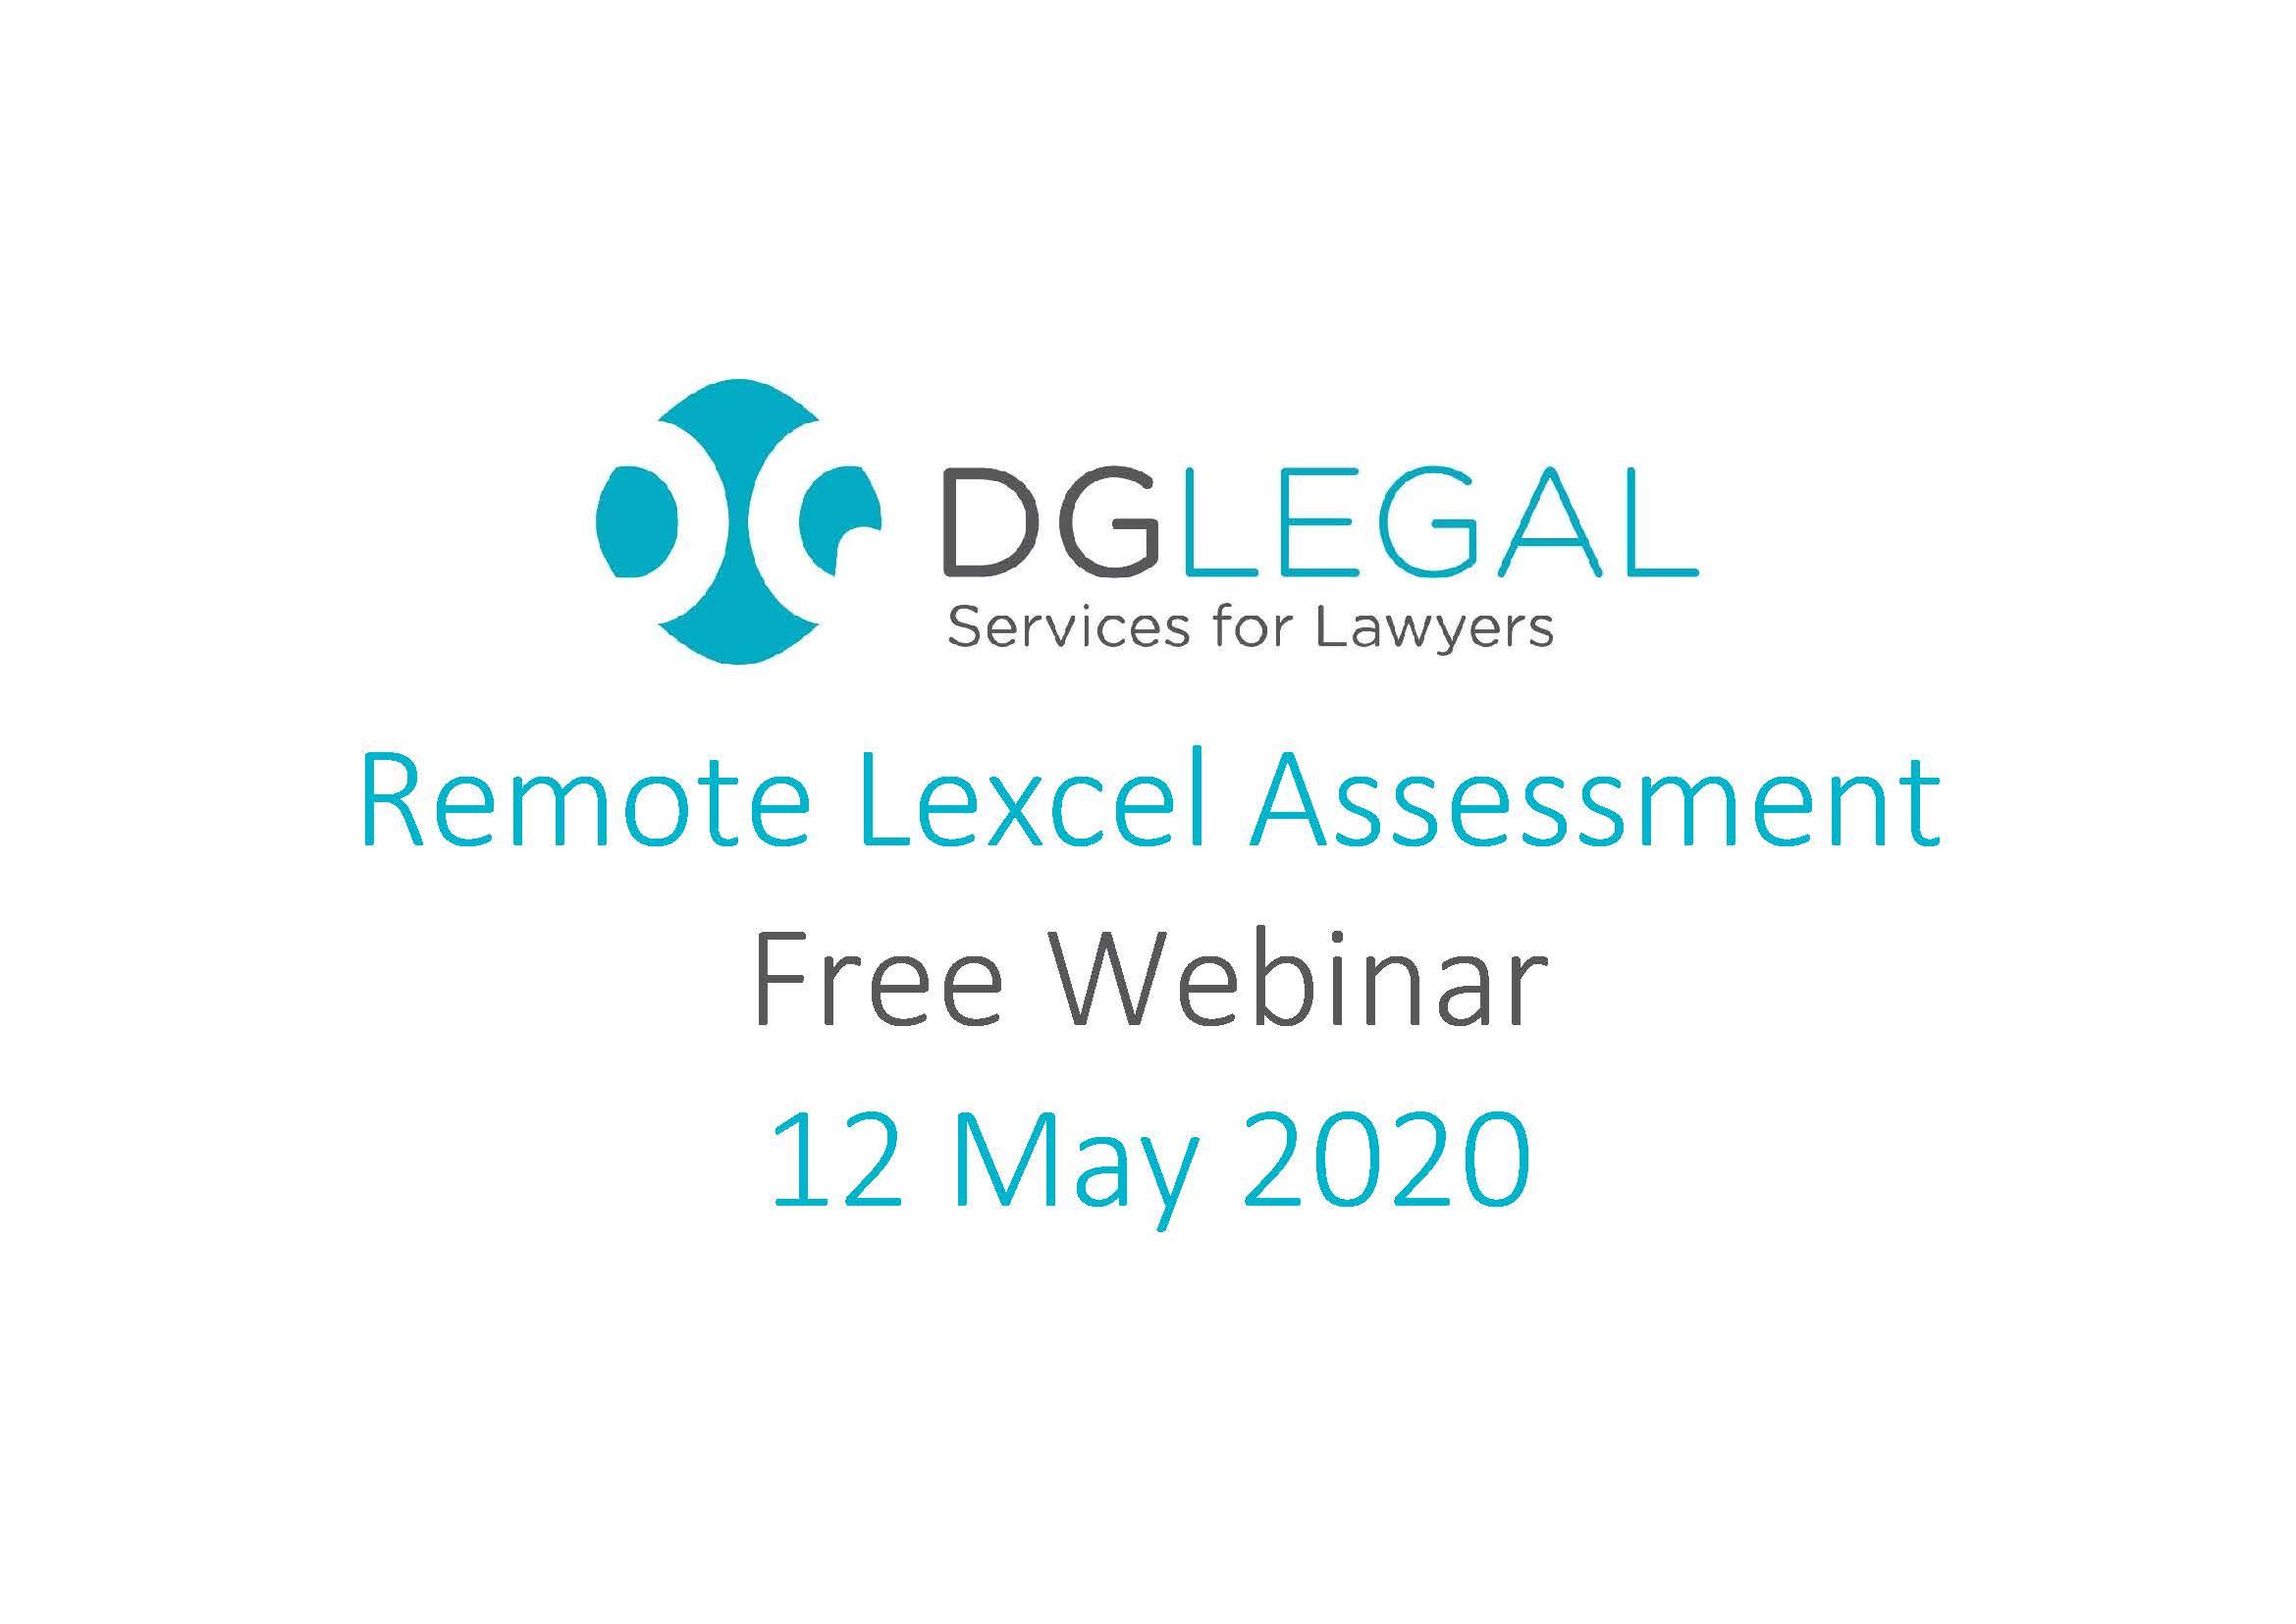 Remote Lexcel Assessment Webinar